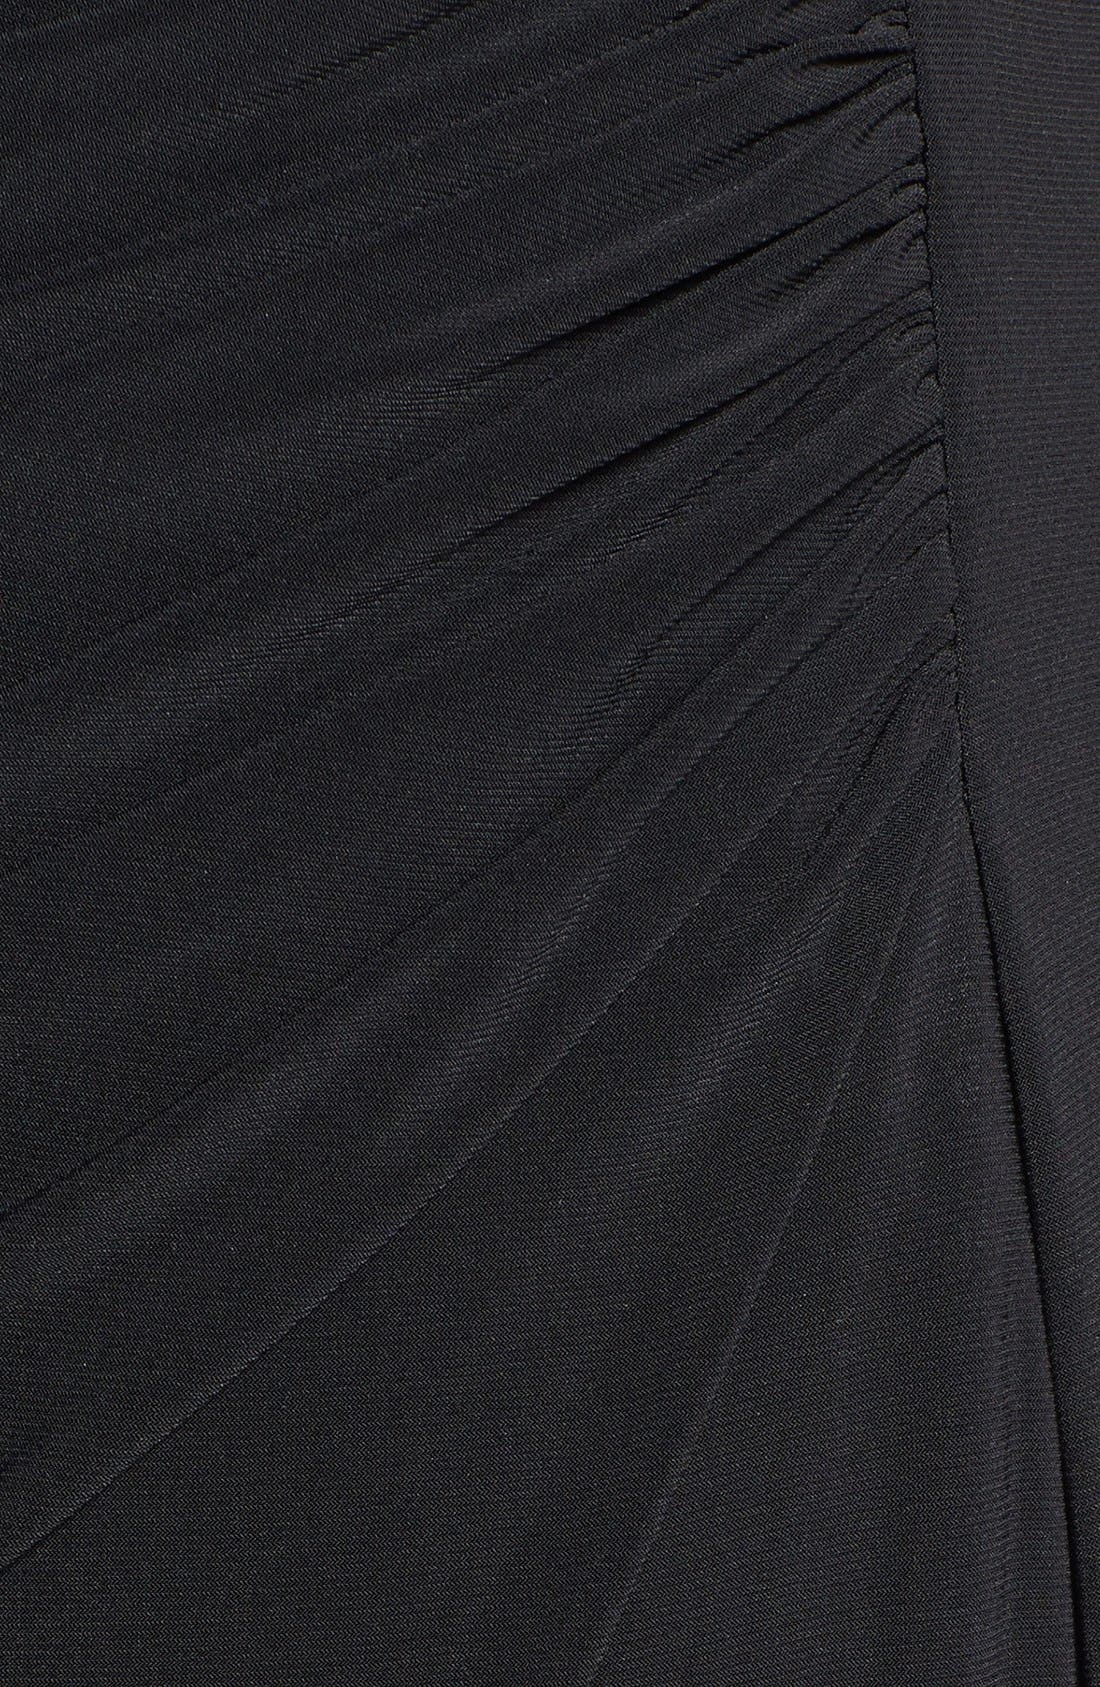 Alternate Image 3  - Xscape Long Stretch Knit Dress (Plus Size)